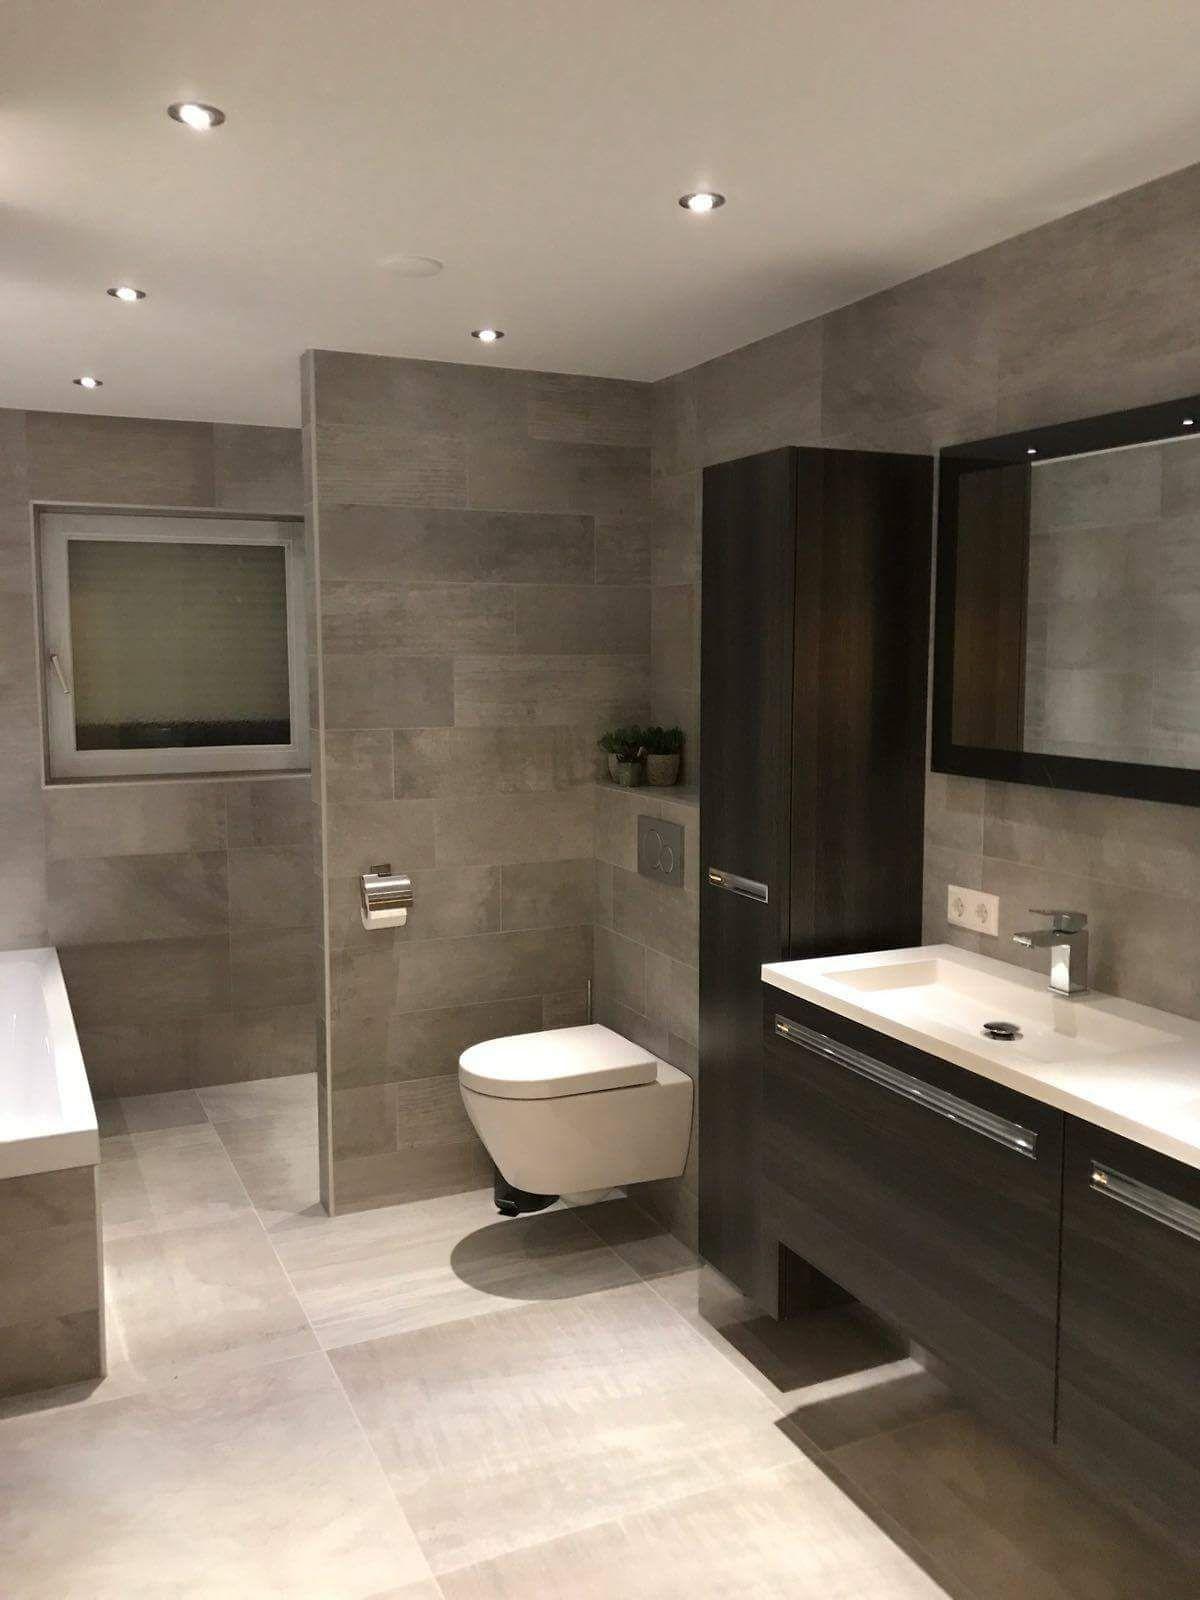 Badkamer strak en toch warm | Stobastone | Pinterest - Badkamer en ...